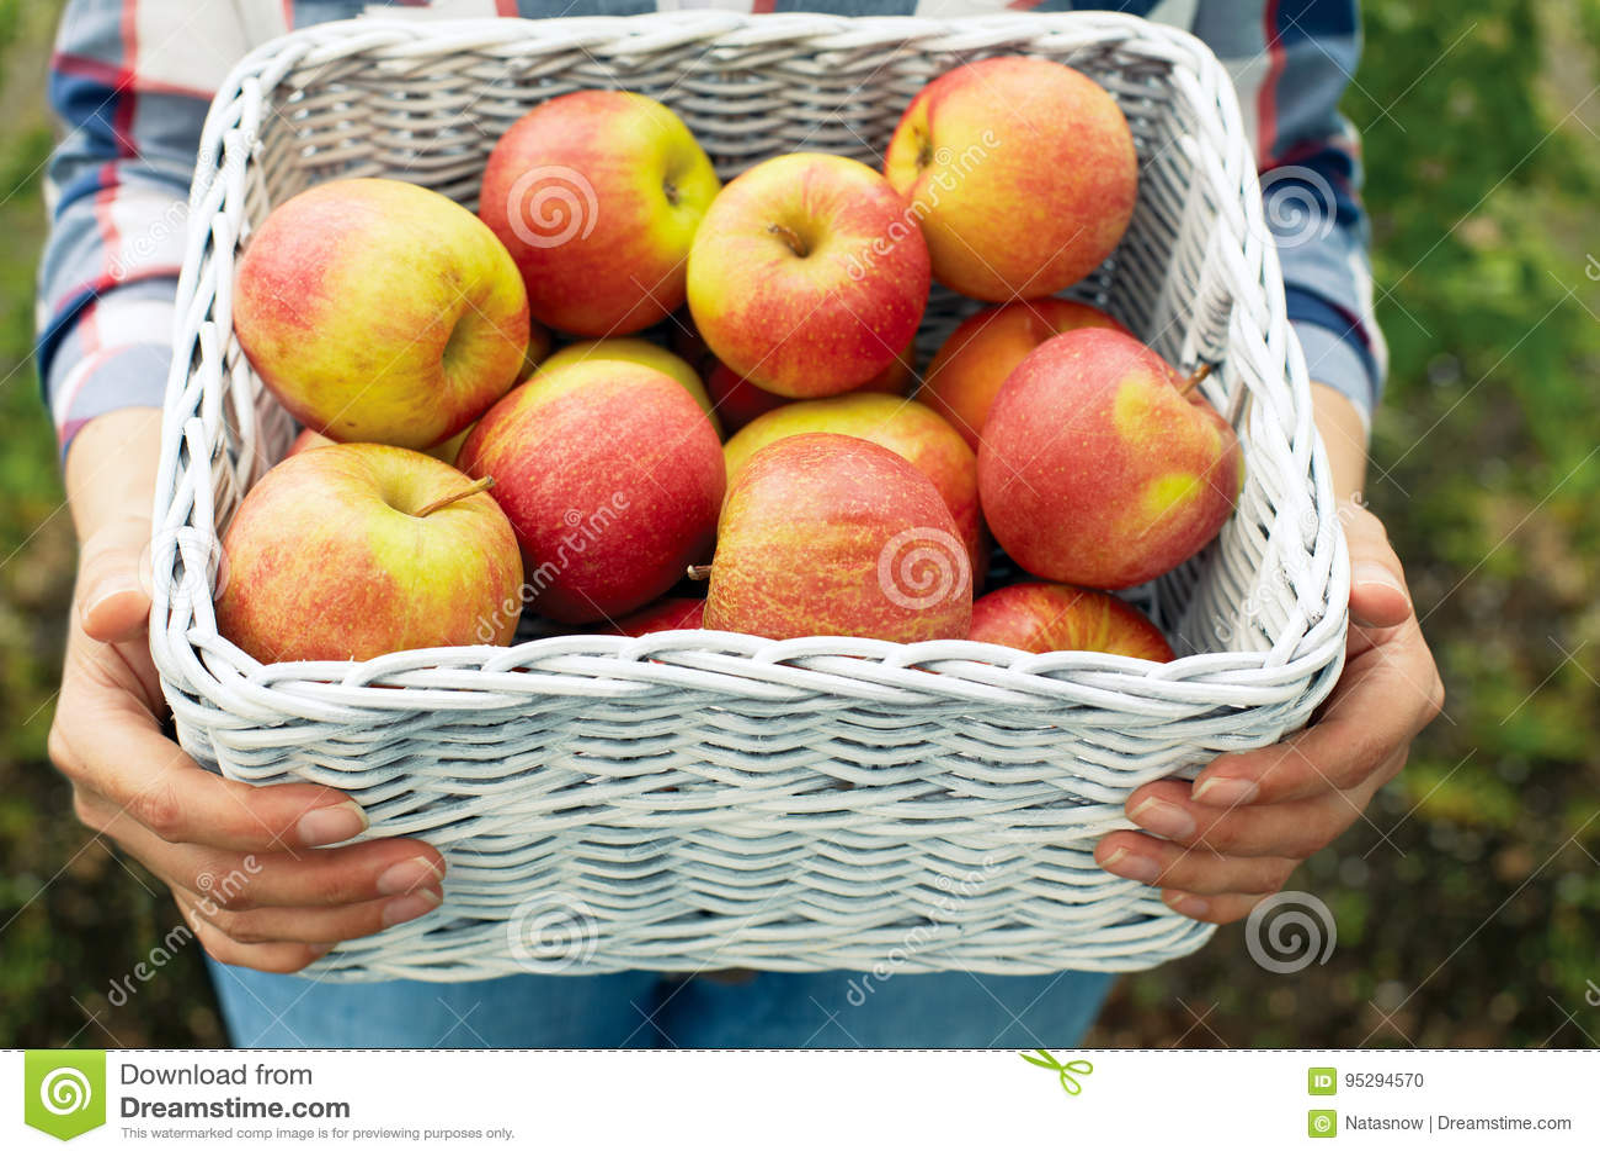 Man holding a wicker basket of ripe apples